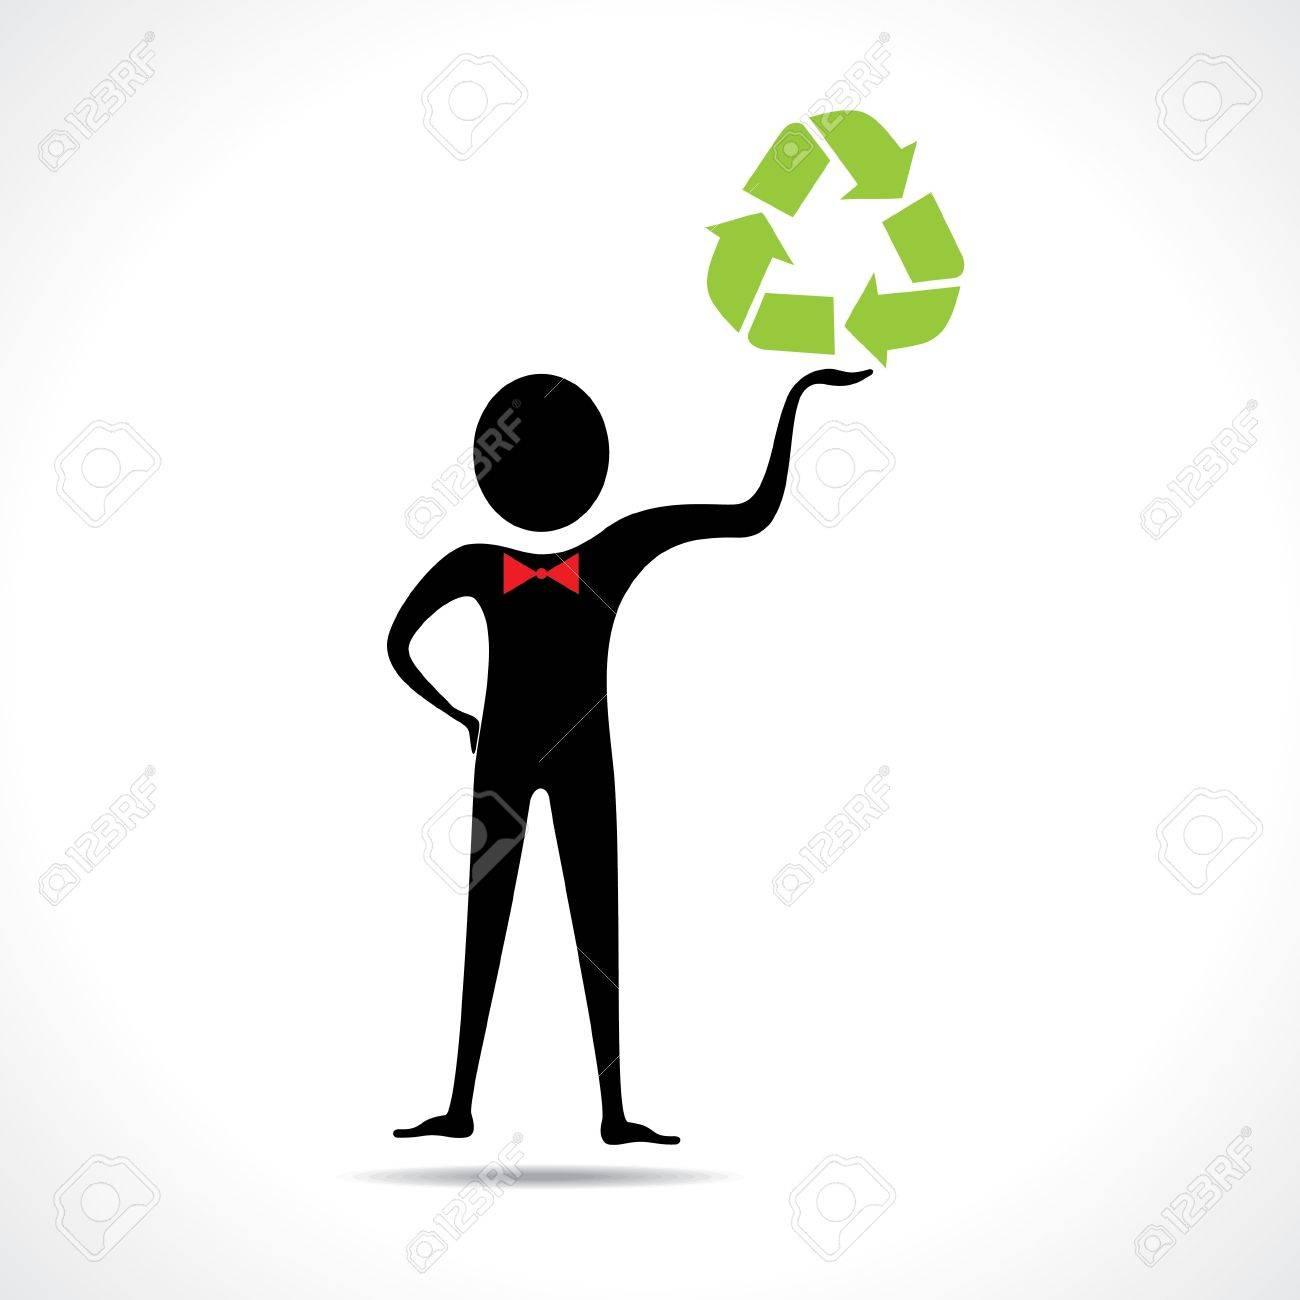 Man holding a recycle icon vector Stock Vector - 20645098